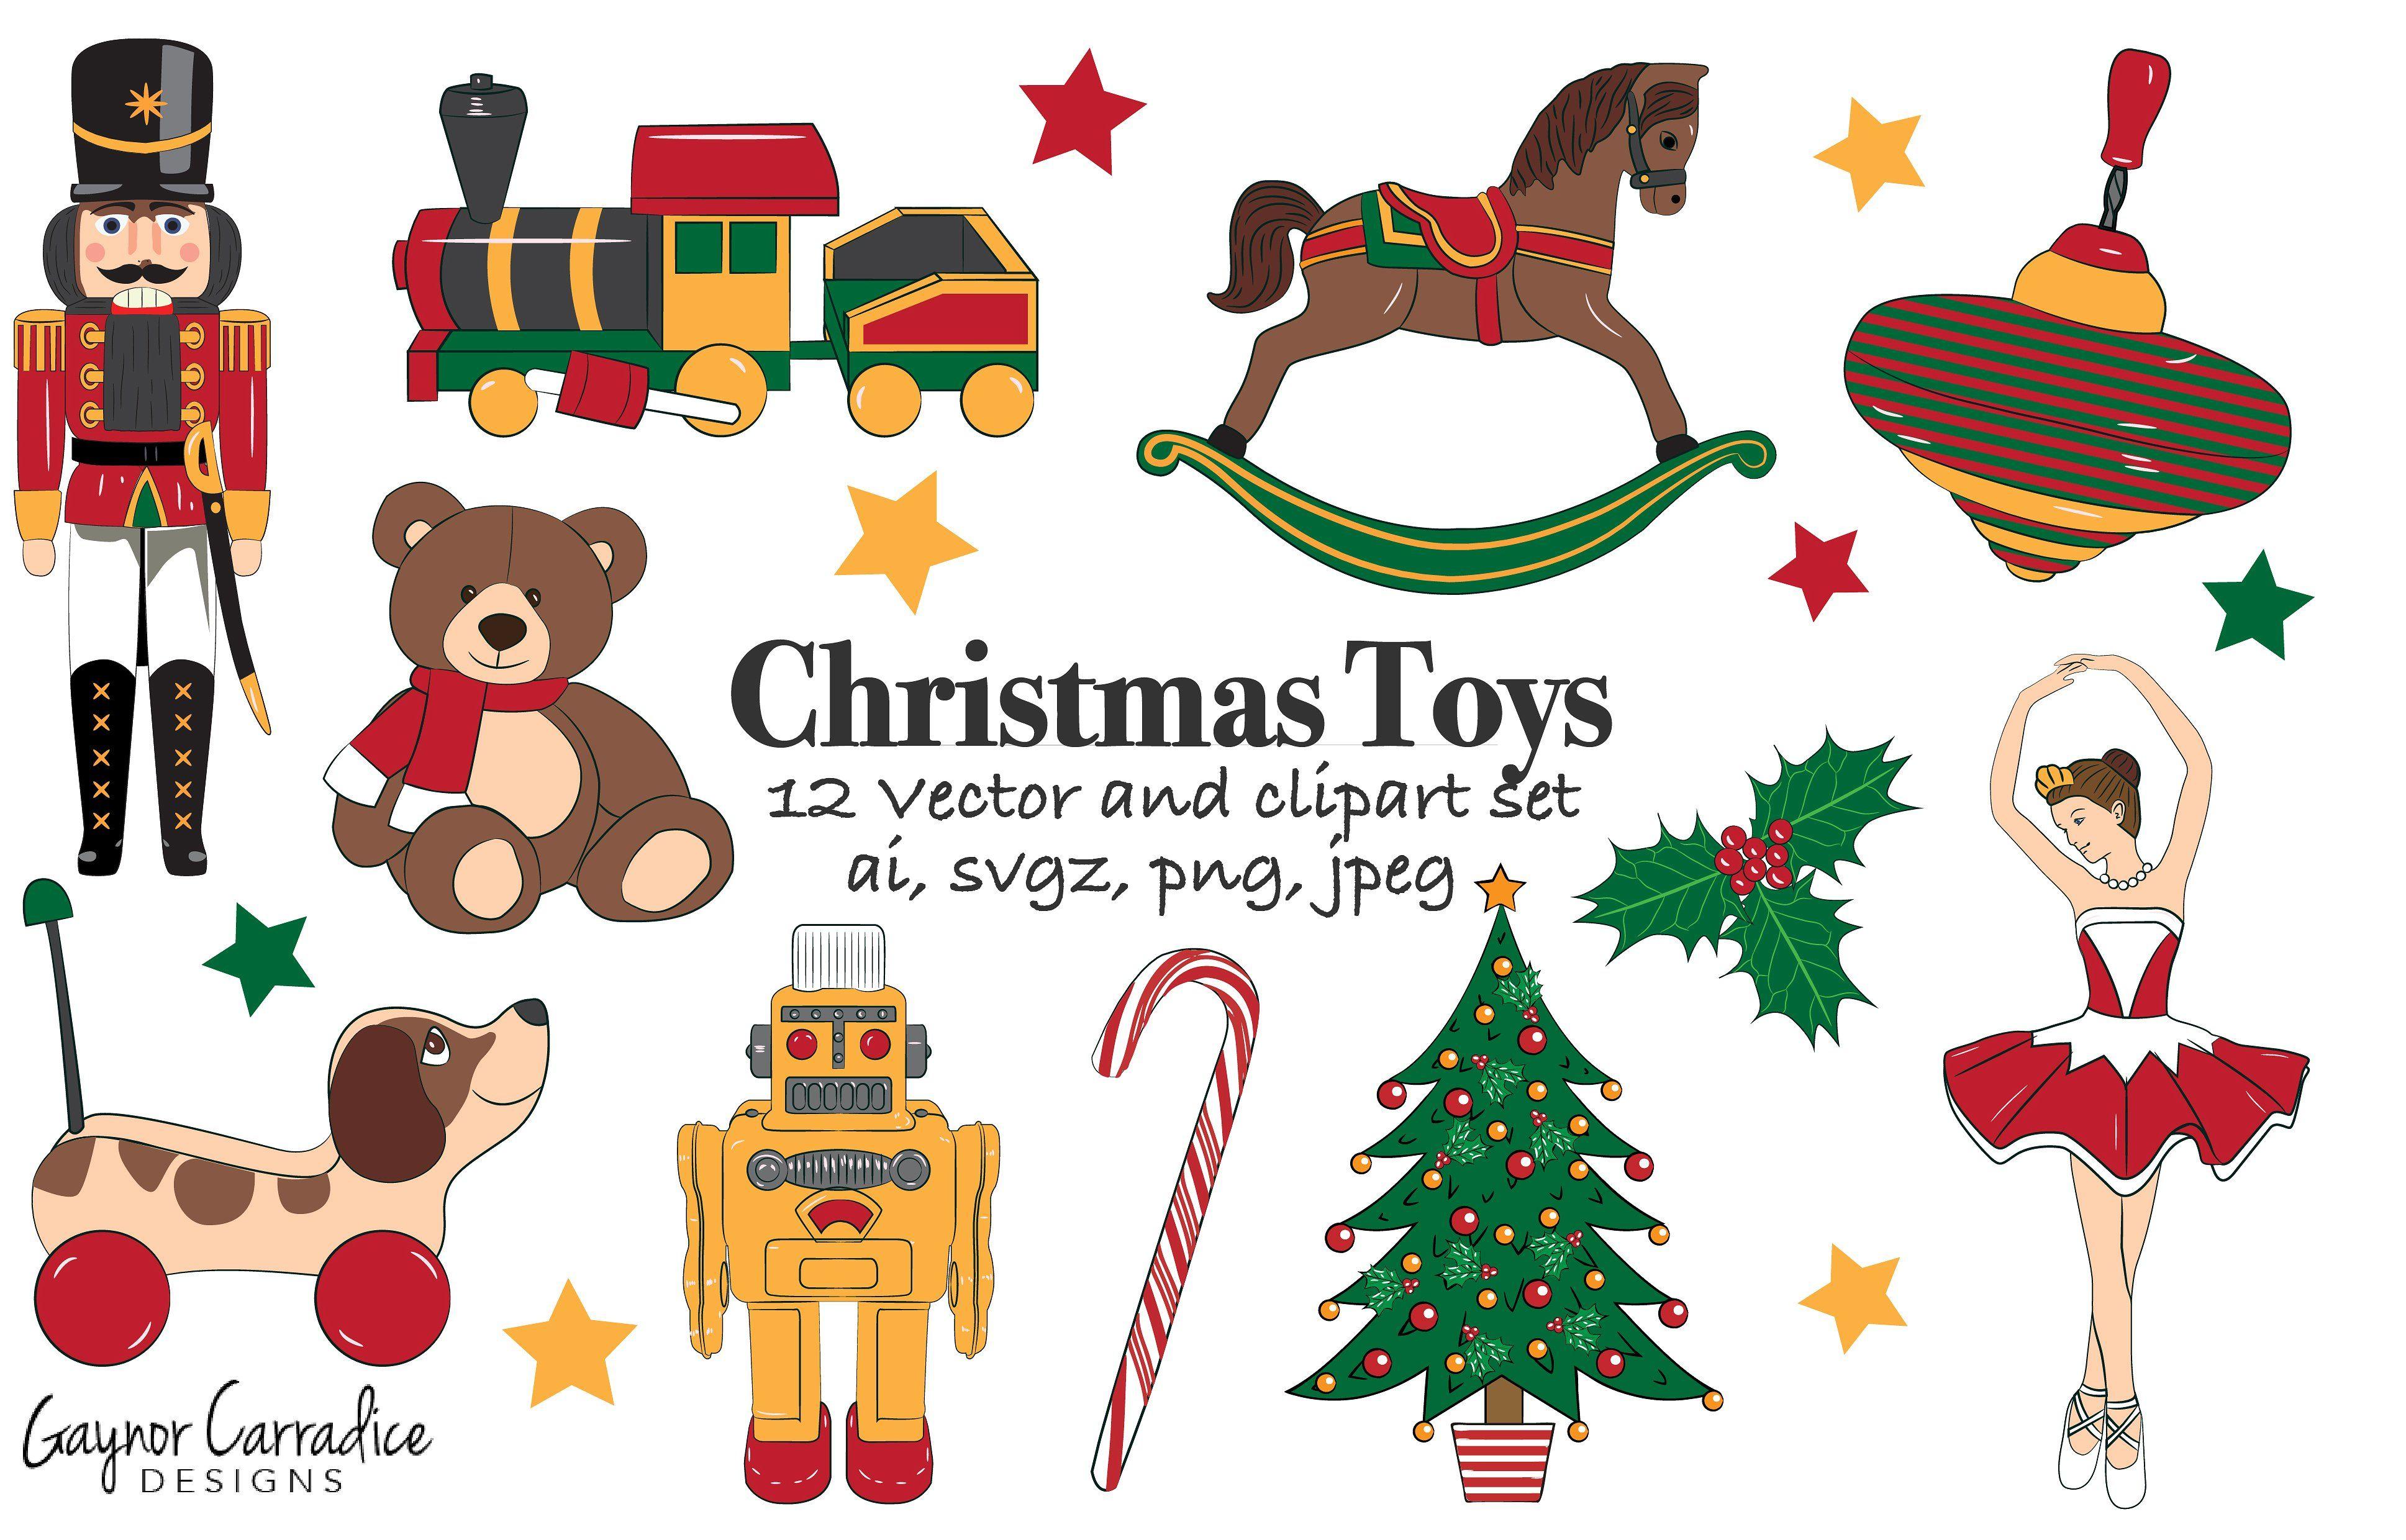 Christmas toys vector set.